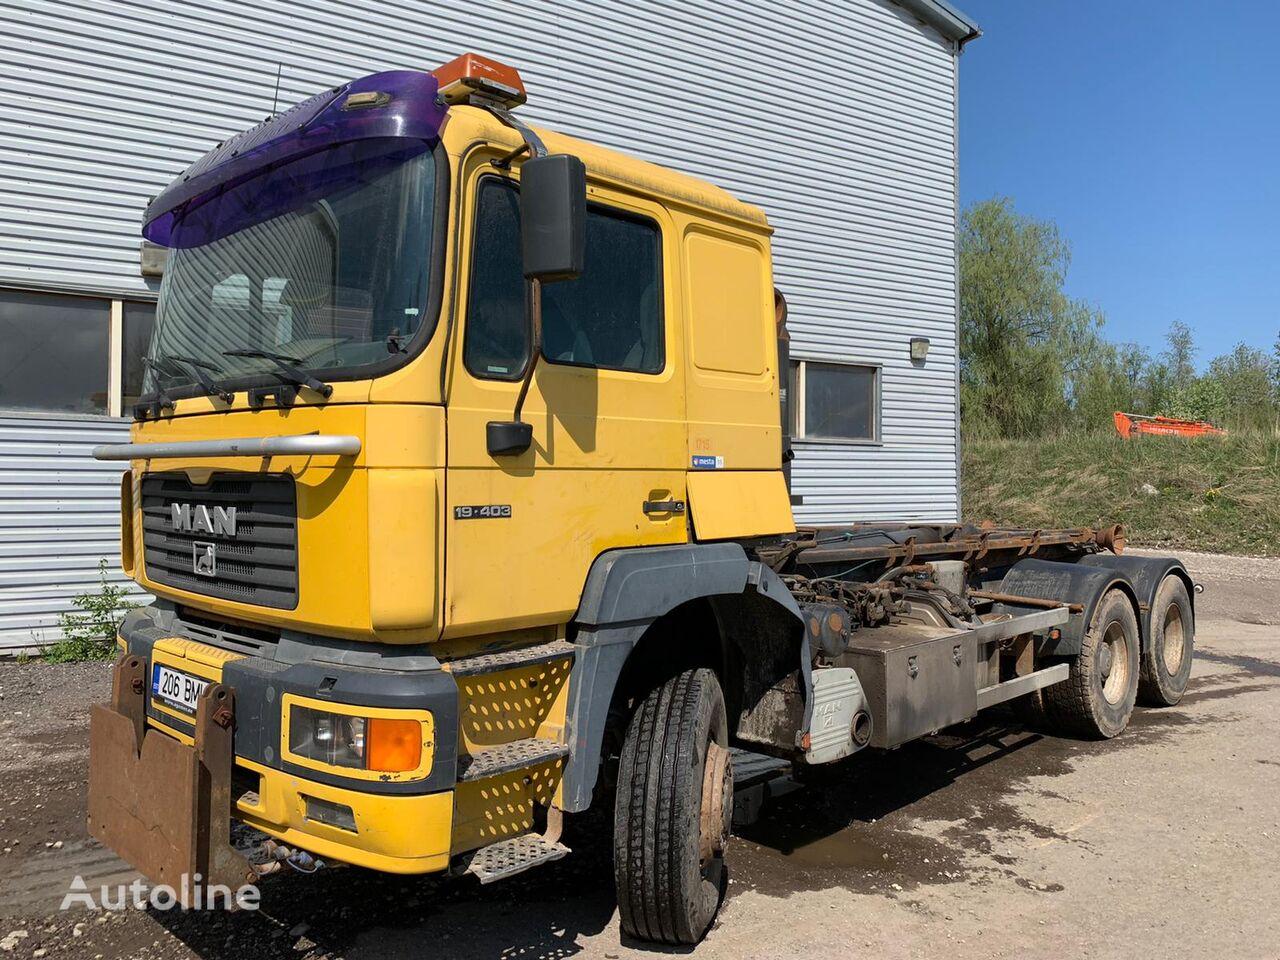 MAN 19.403  4X4X2 hook lift truck